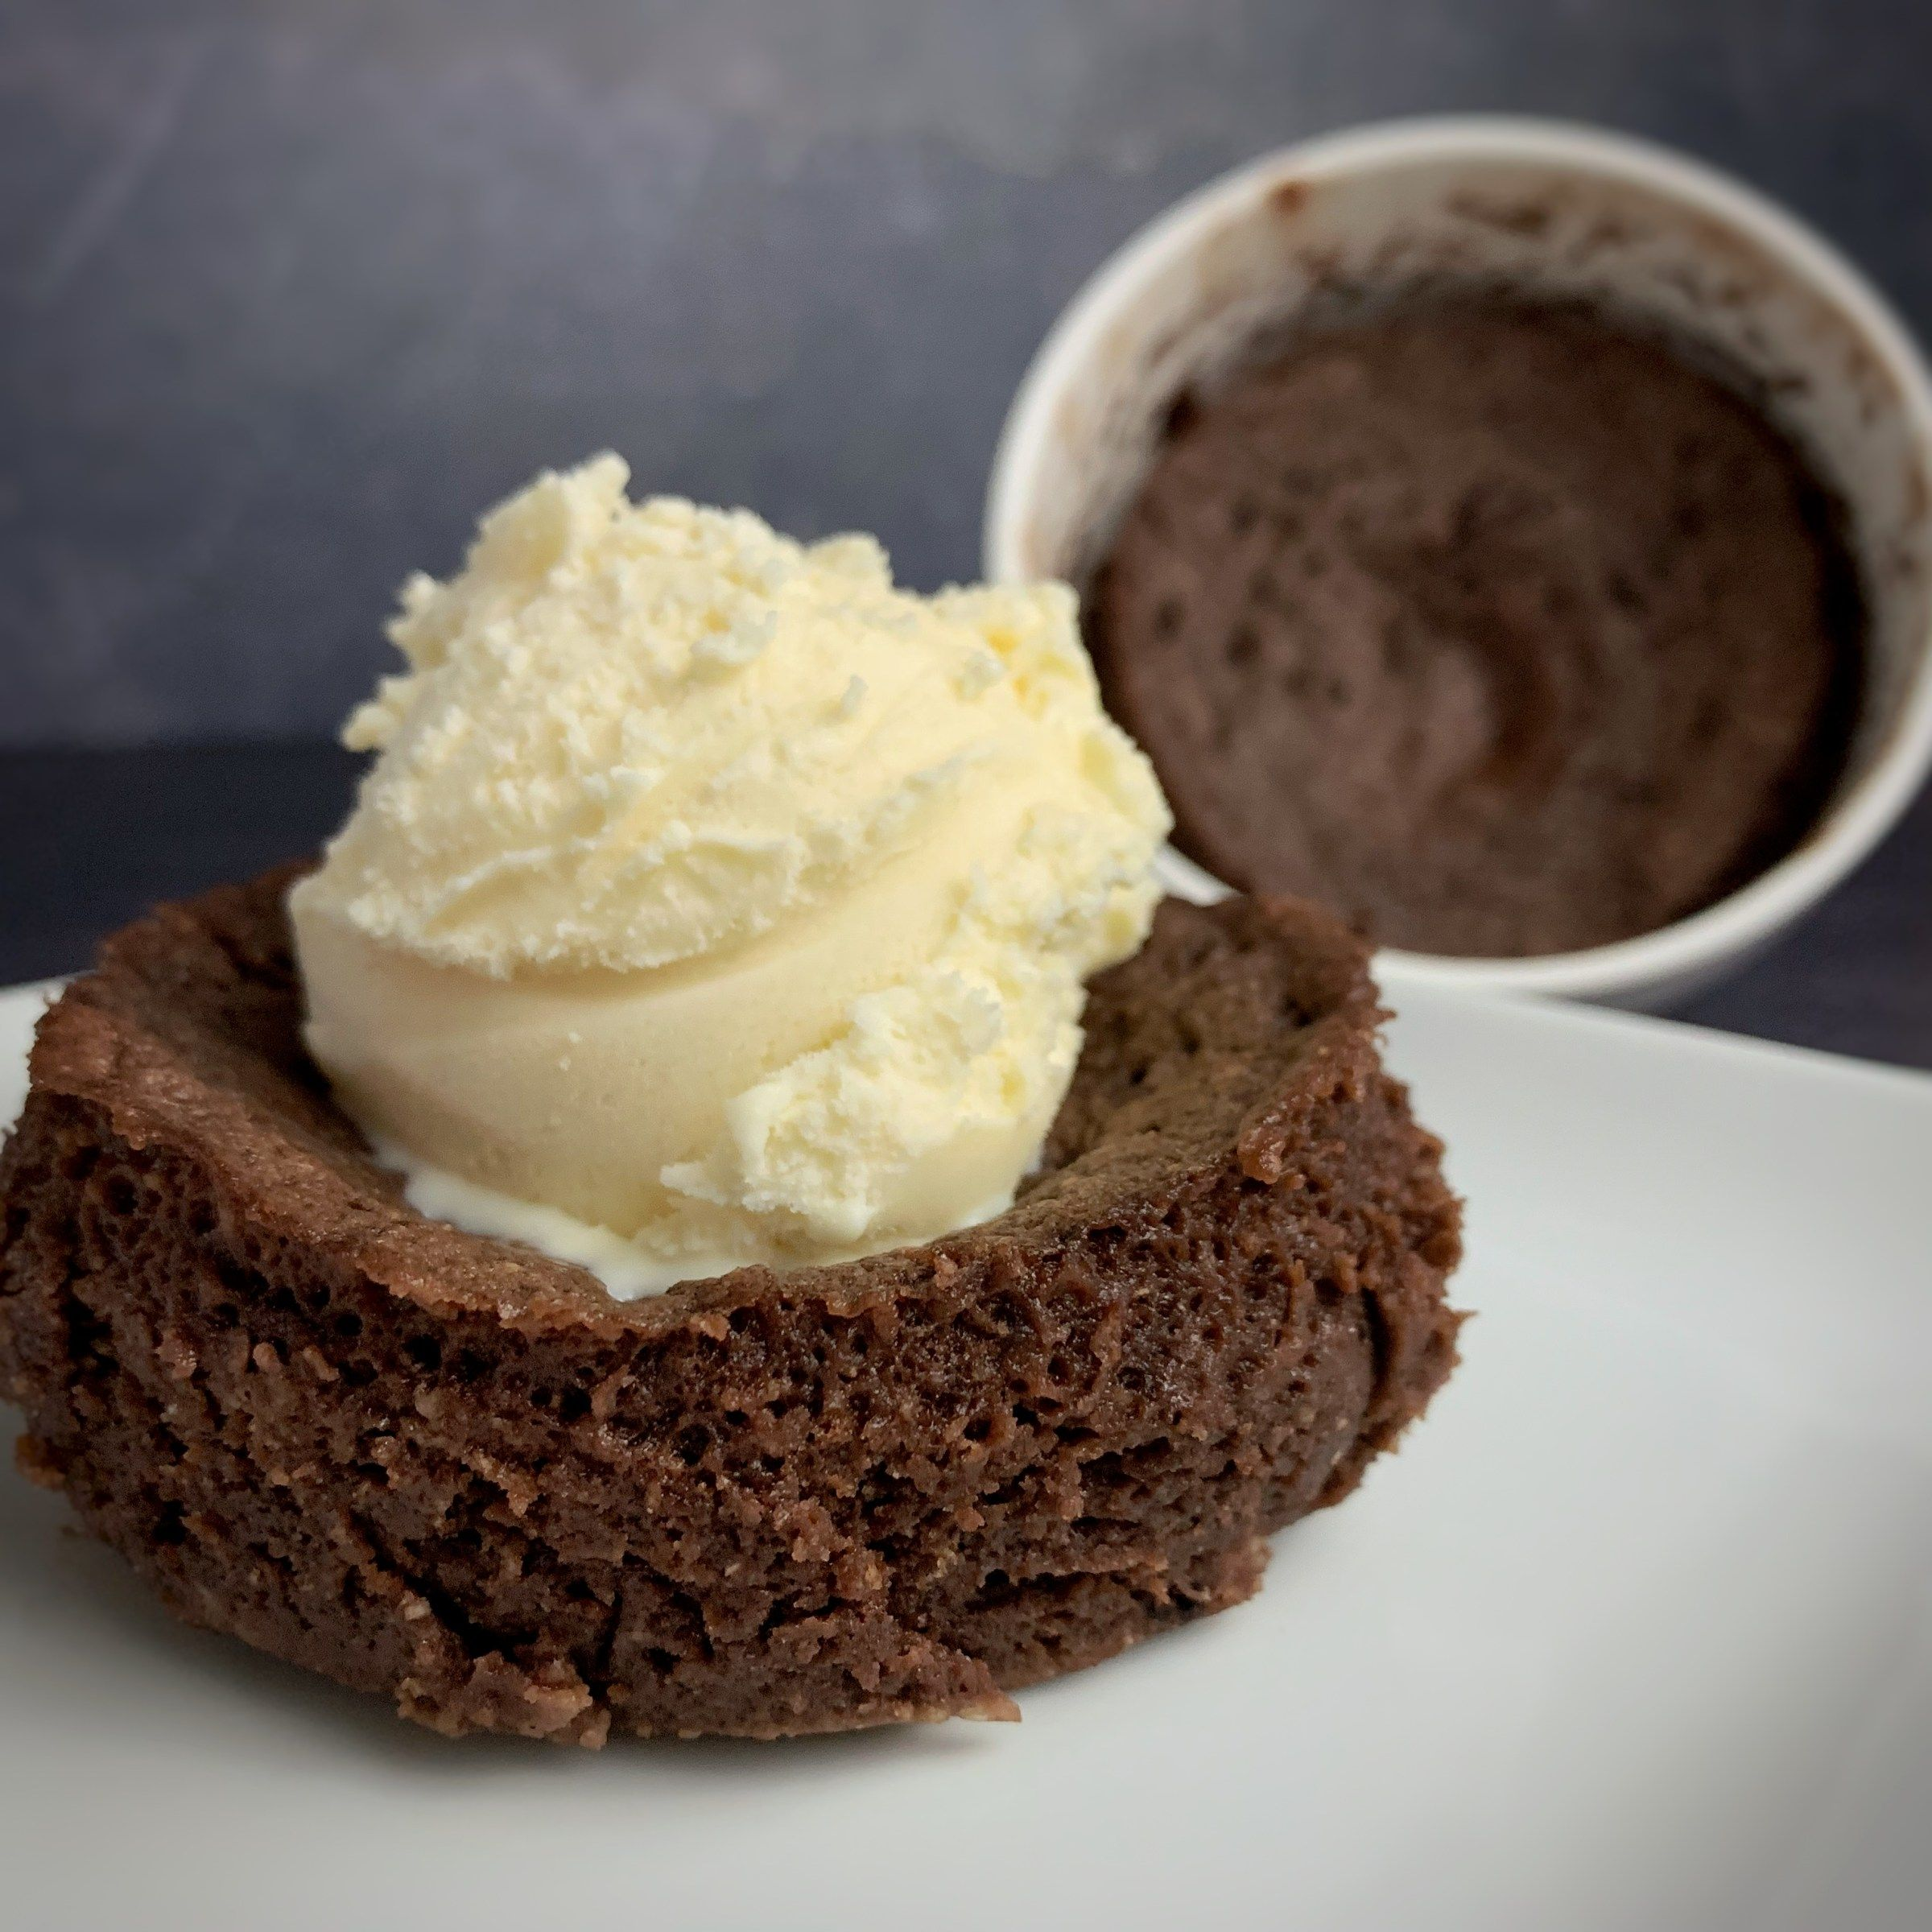 Chocolate protein mug cake a swerve chocolate cake mix